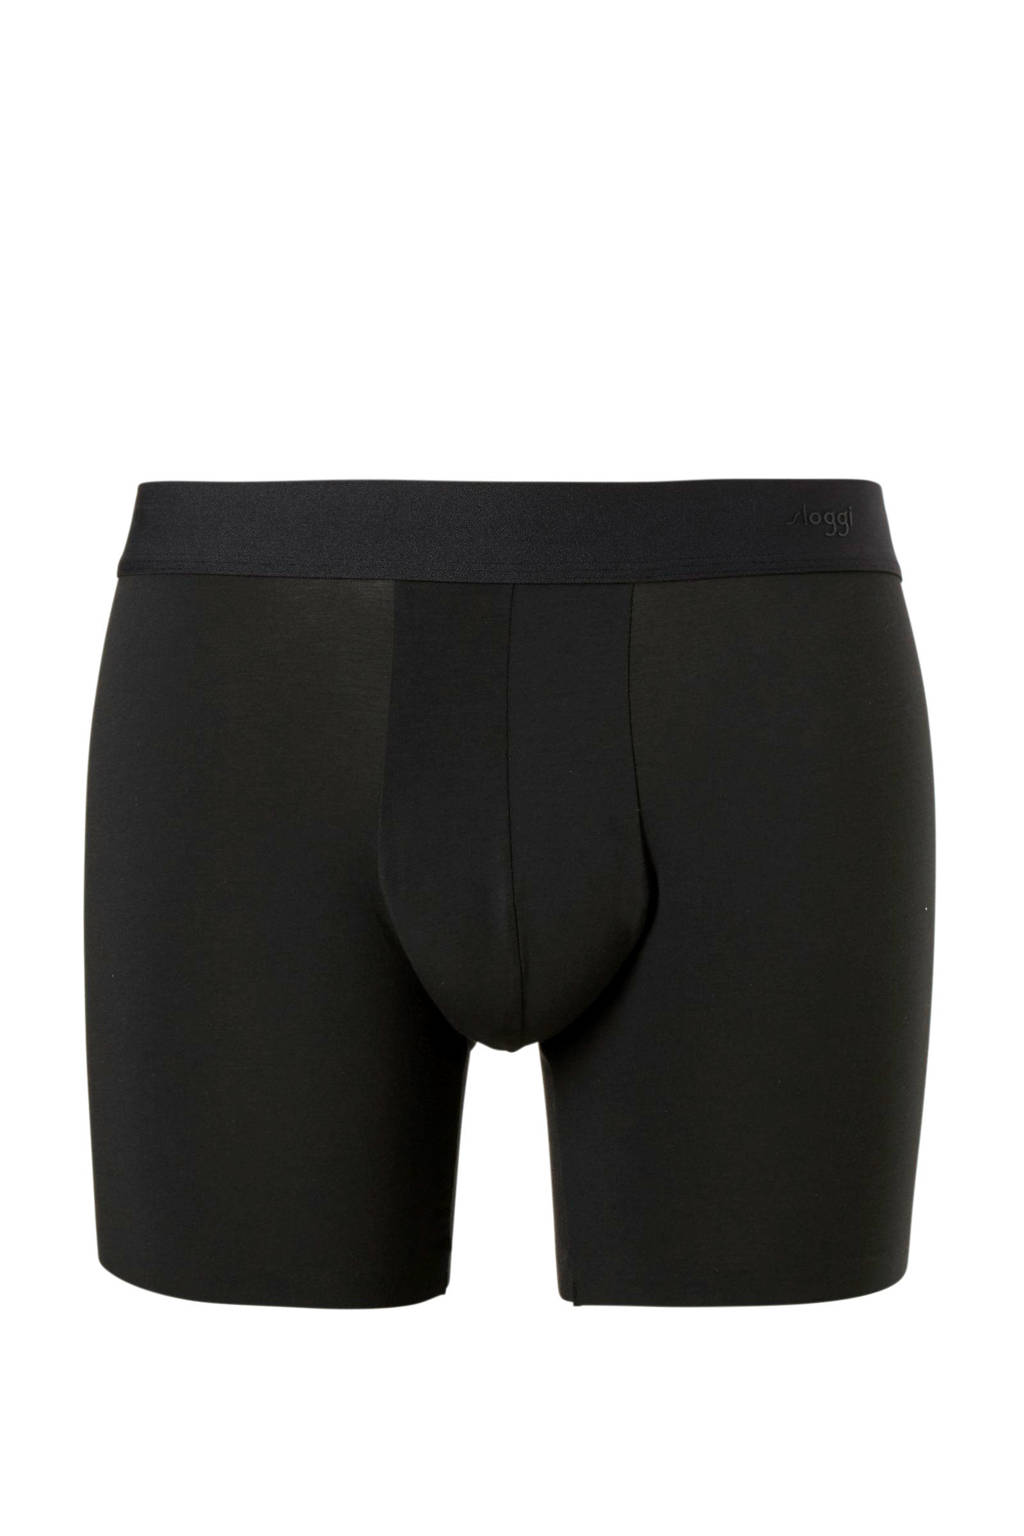 Sloggi Zero Feel boxershort zwart, Zwart